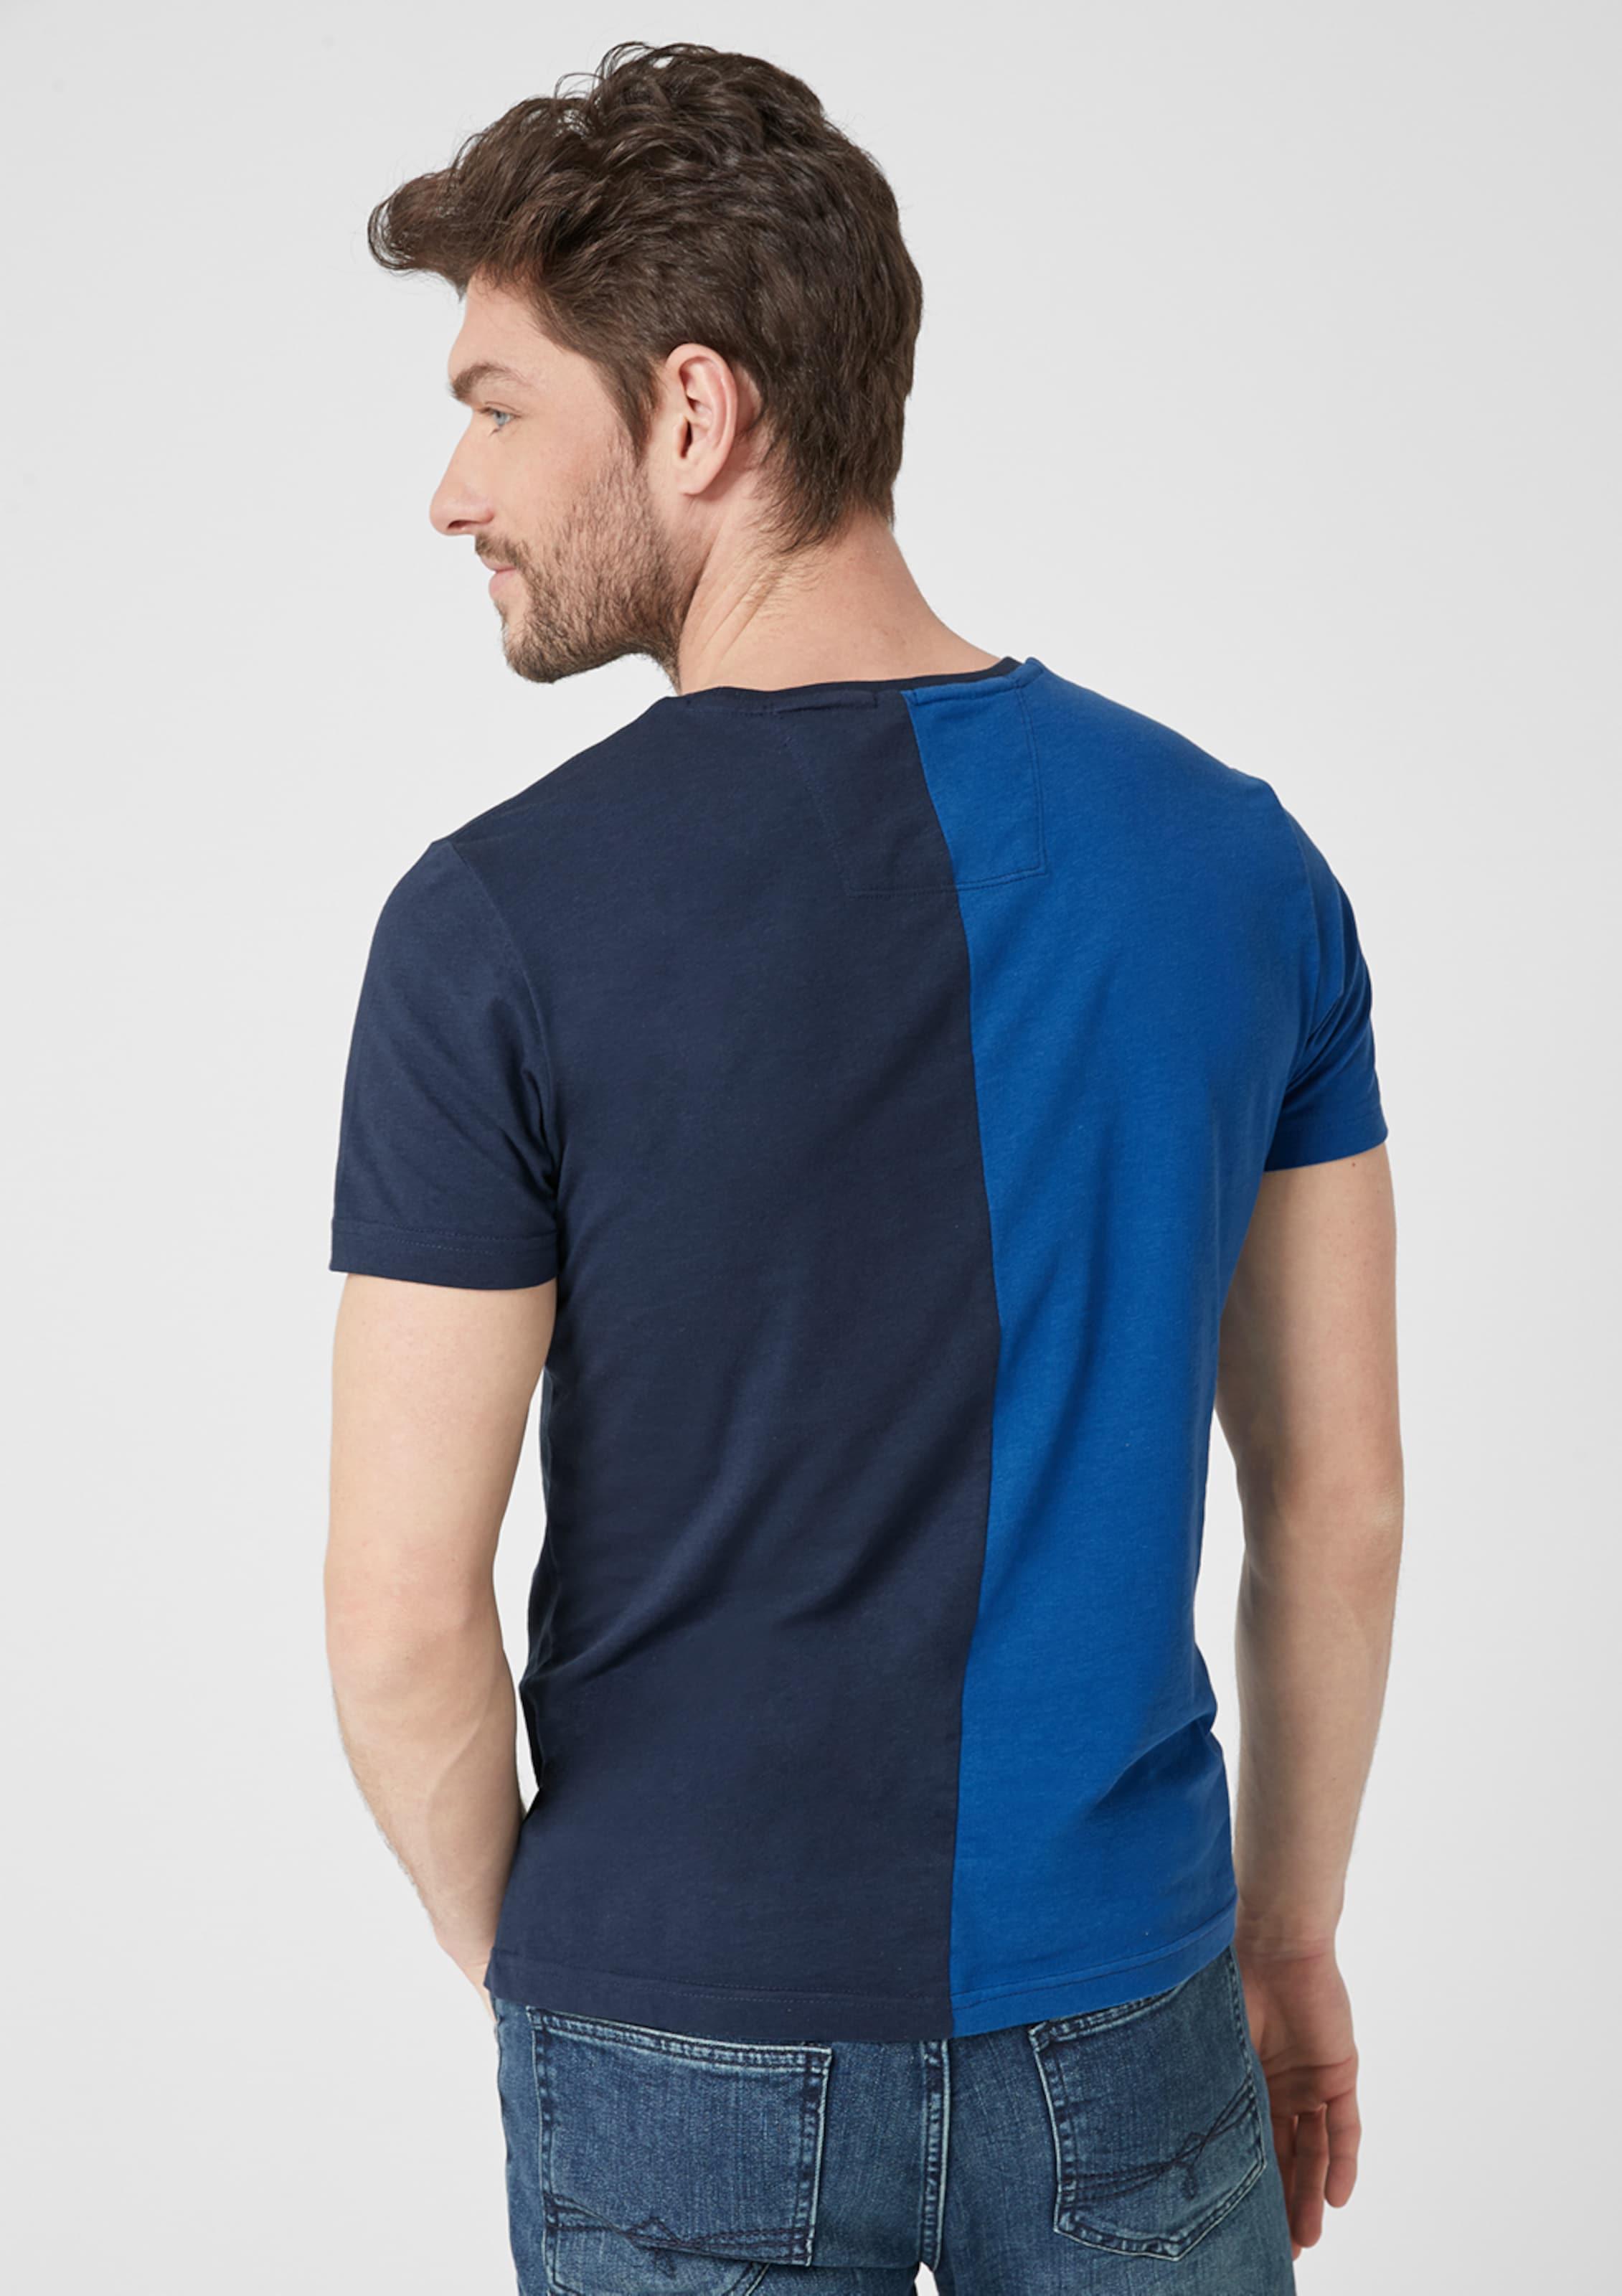 S In Weiß NachtblauHimmelblau T shirt oliver Ifm7b6yvYg